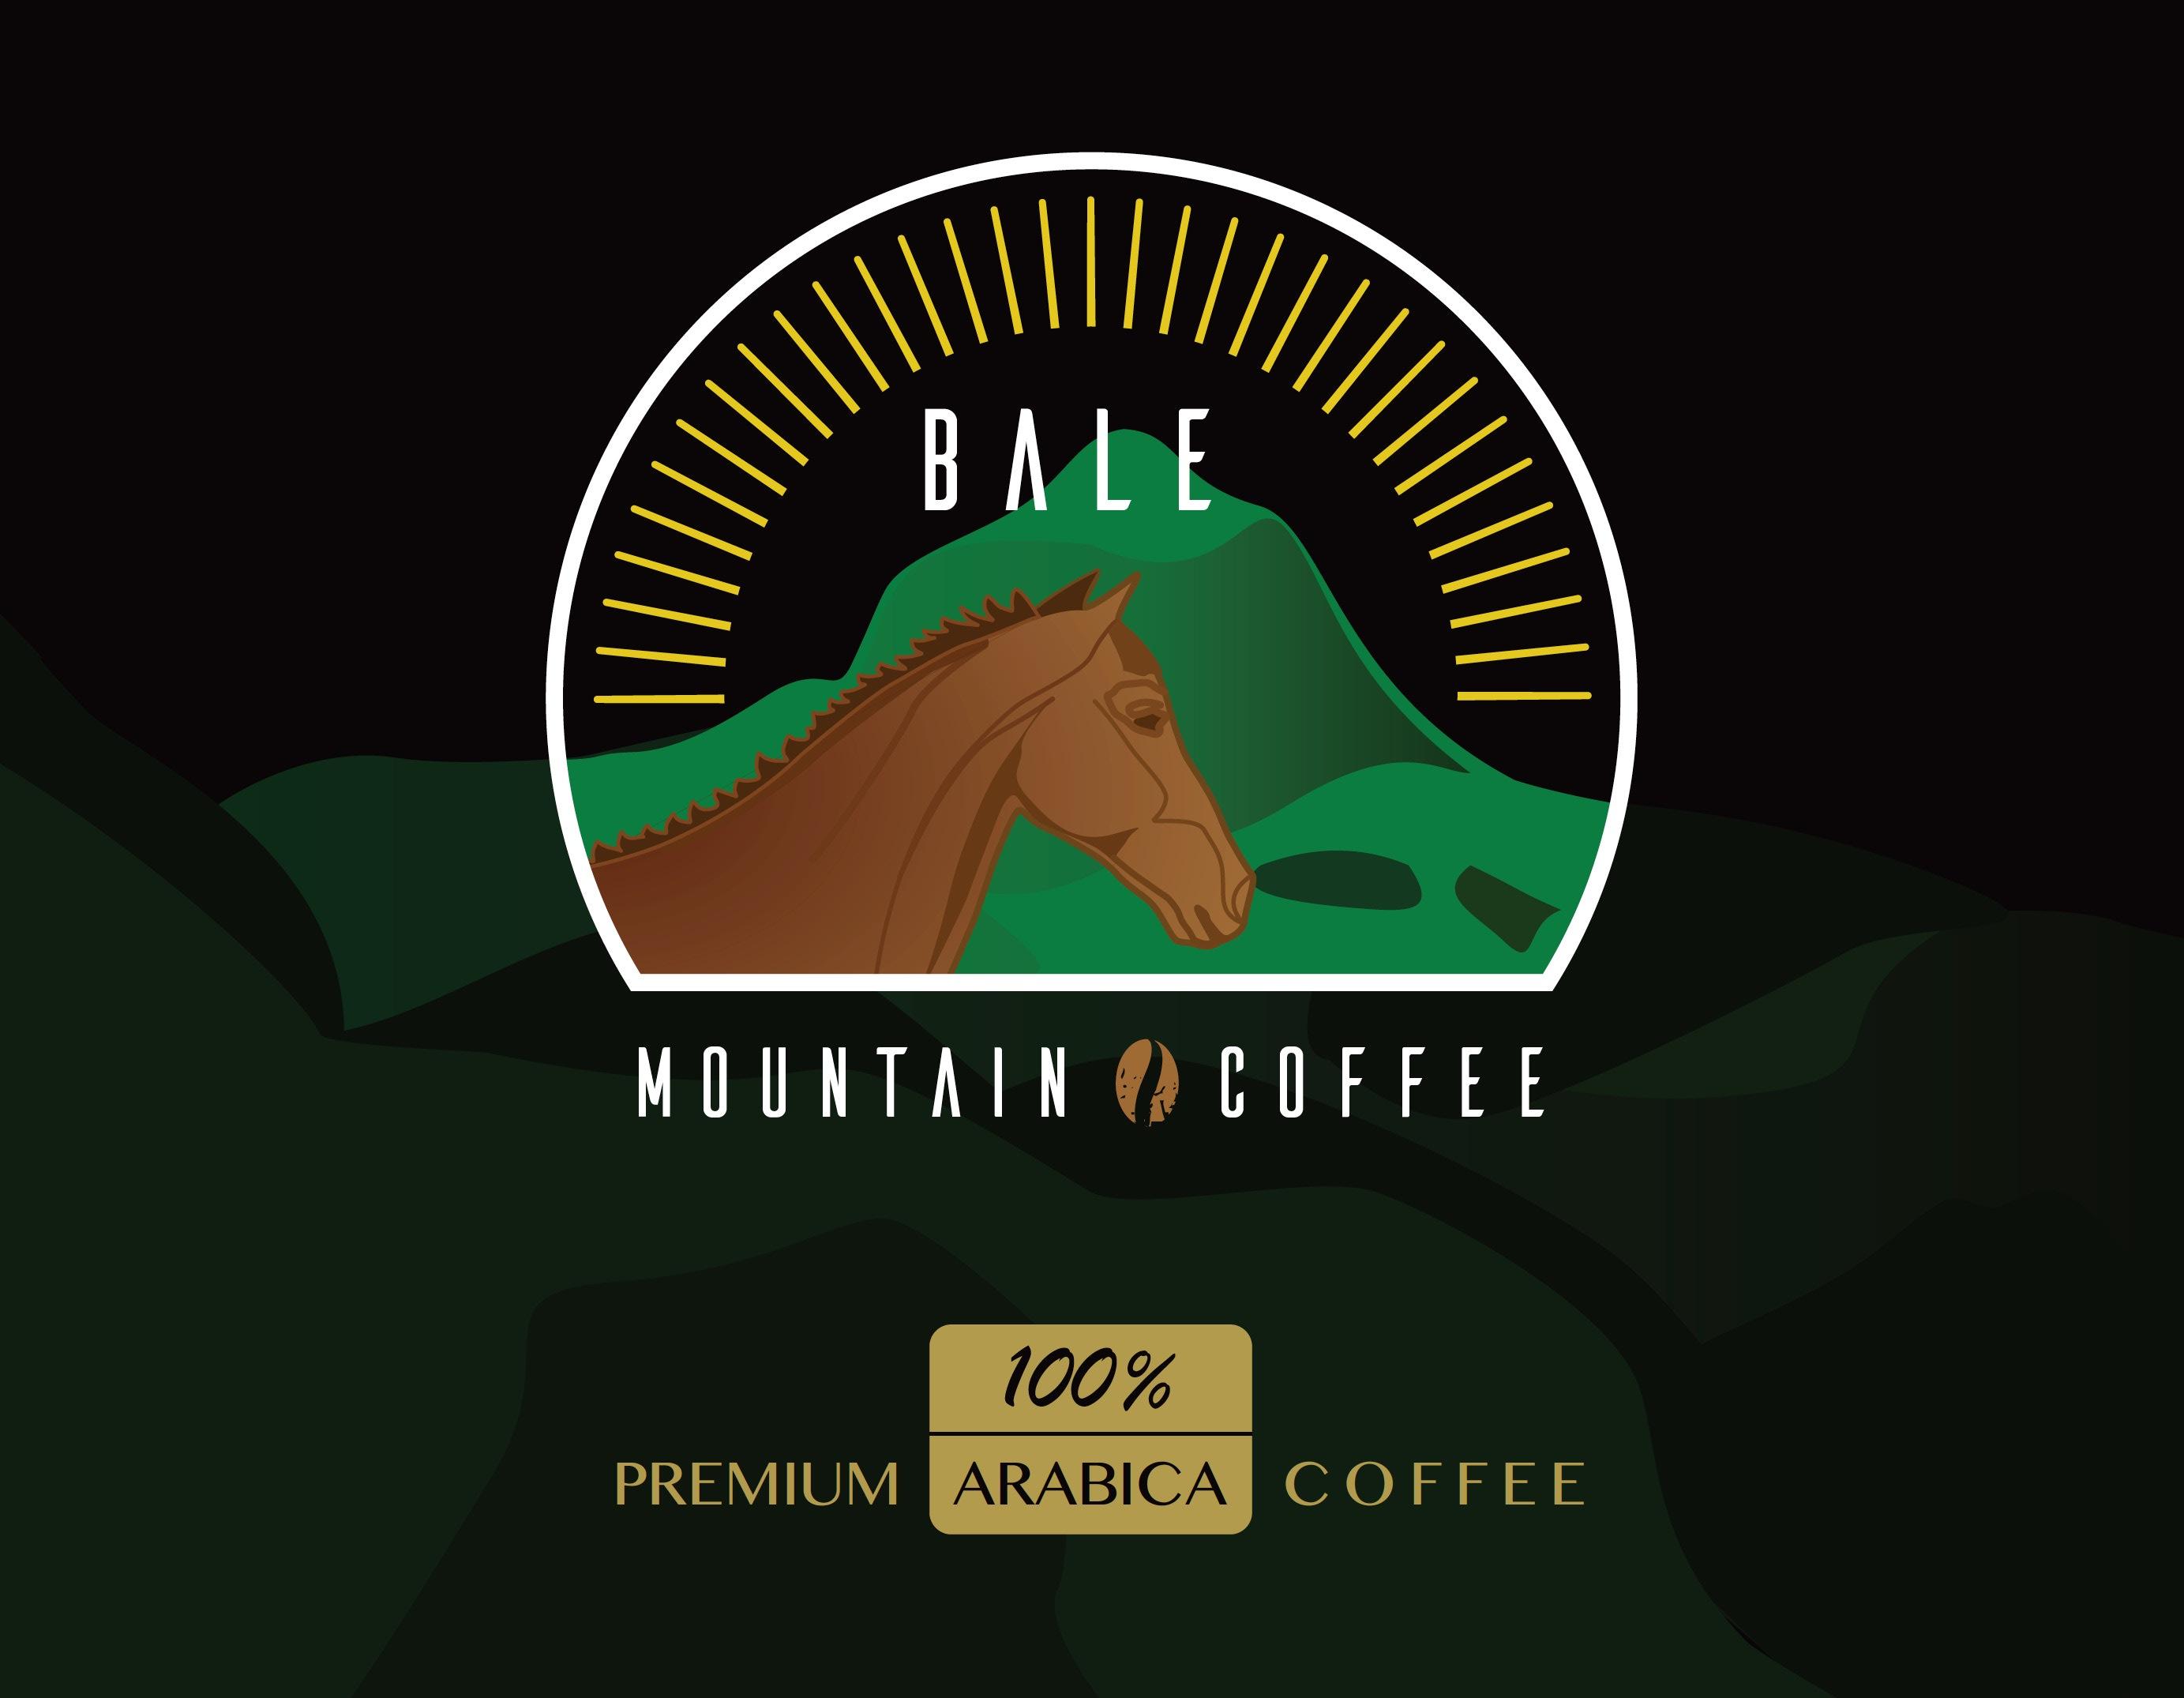 Bale Mountain Logo